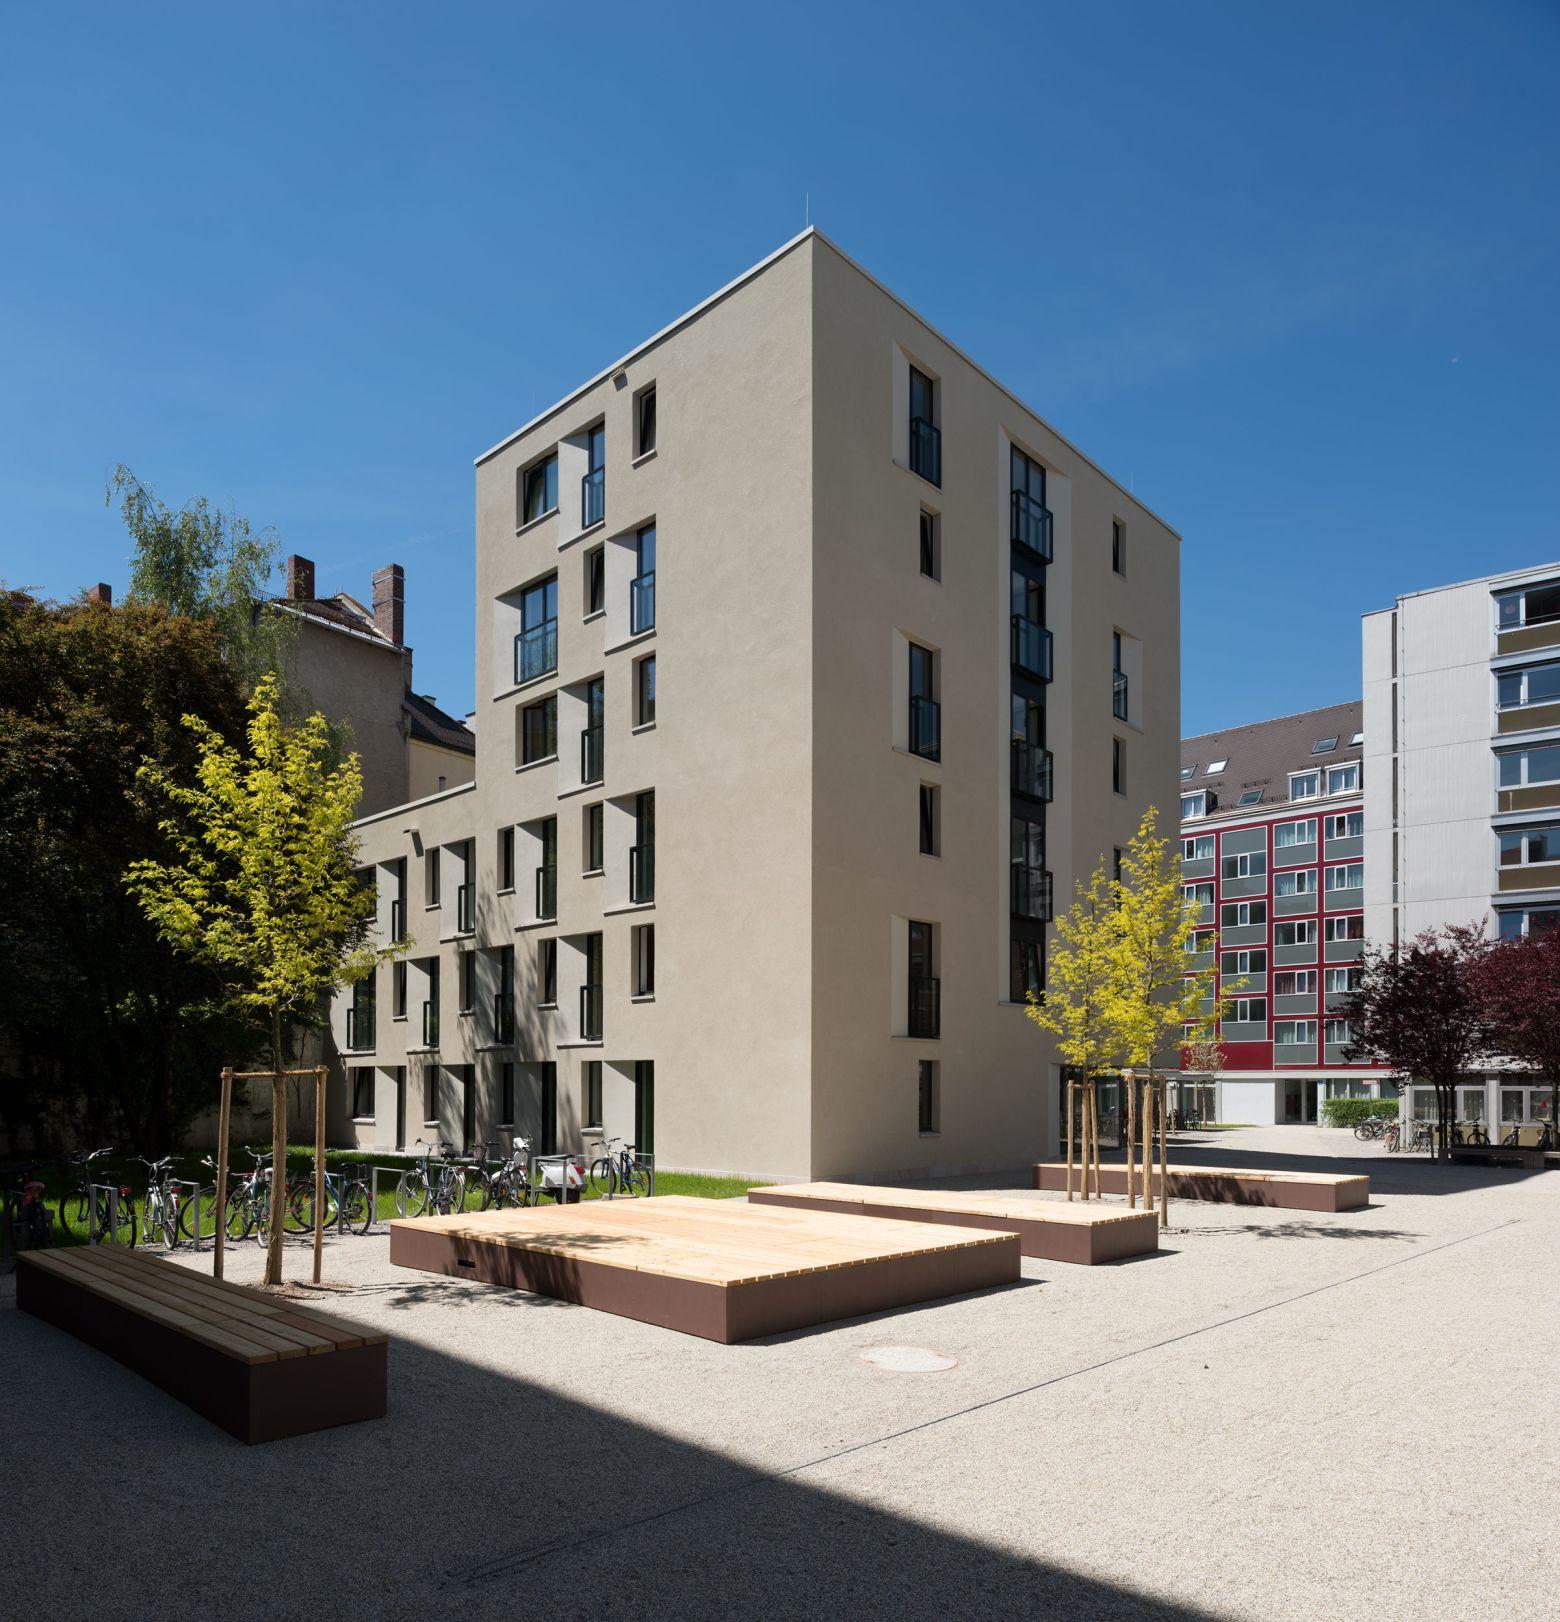 Sandfarbener Kratzputz mit Denkmalamt abgestimmt